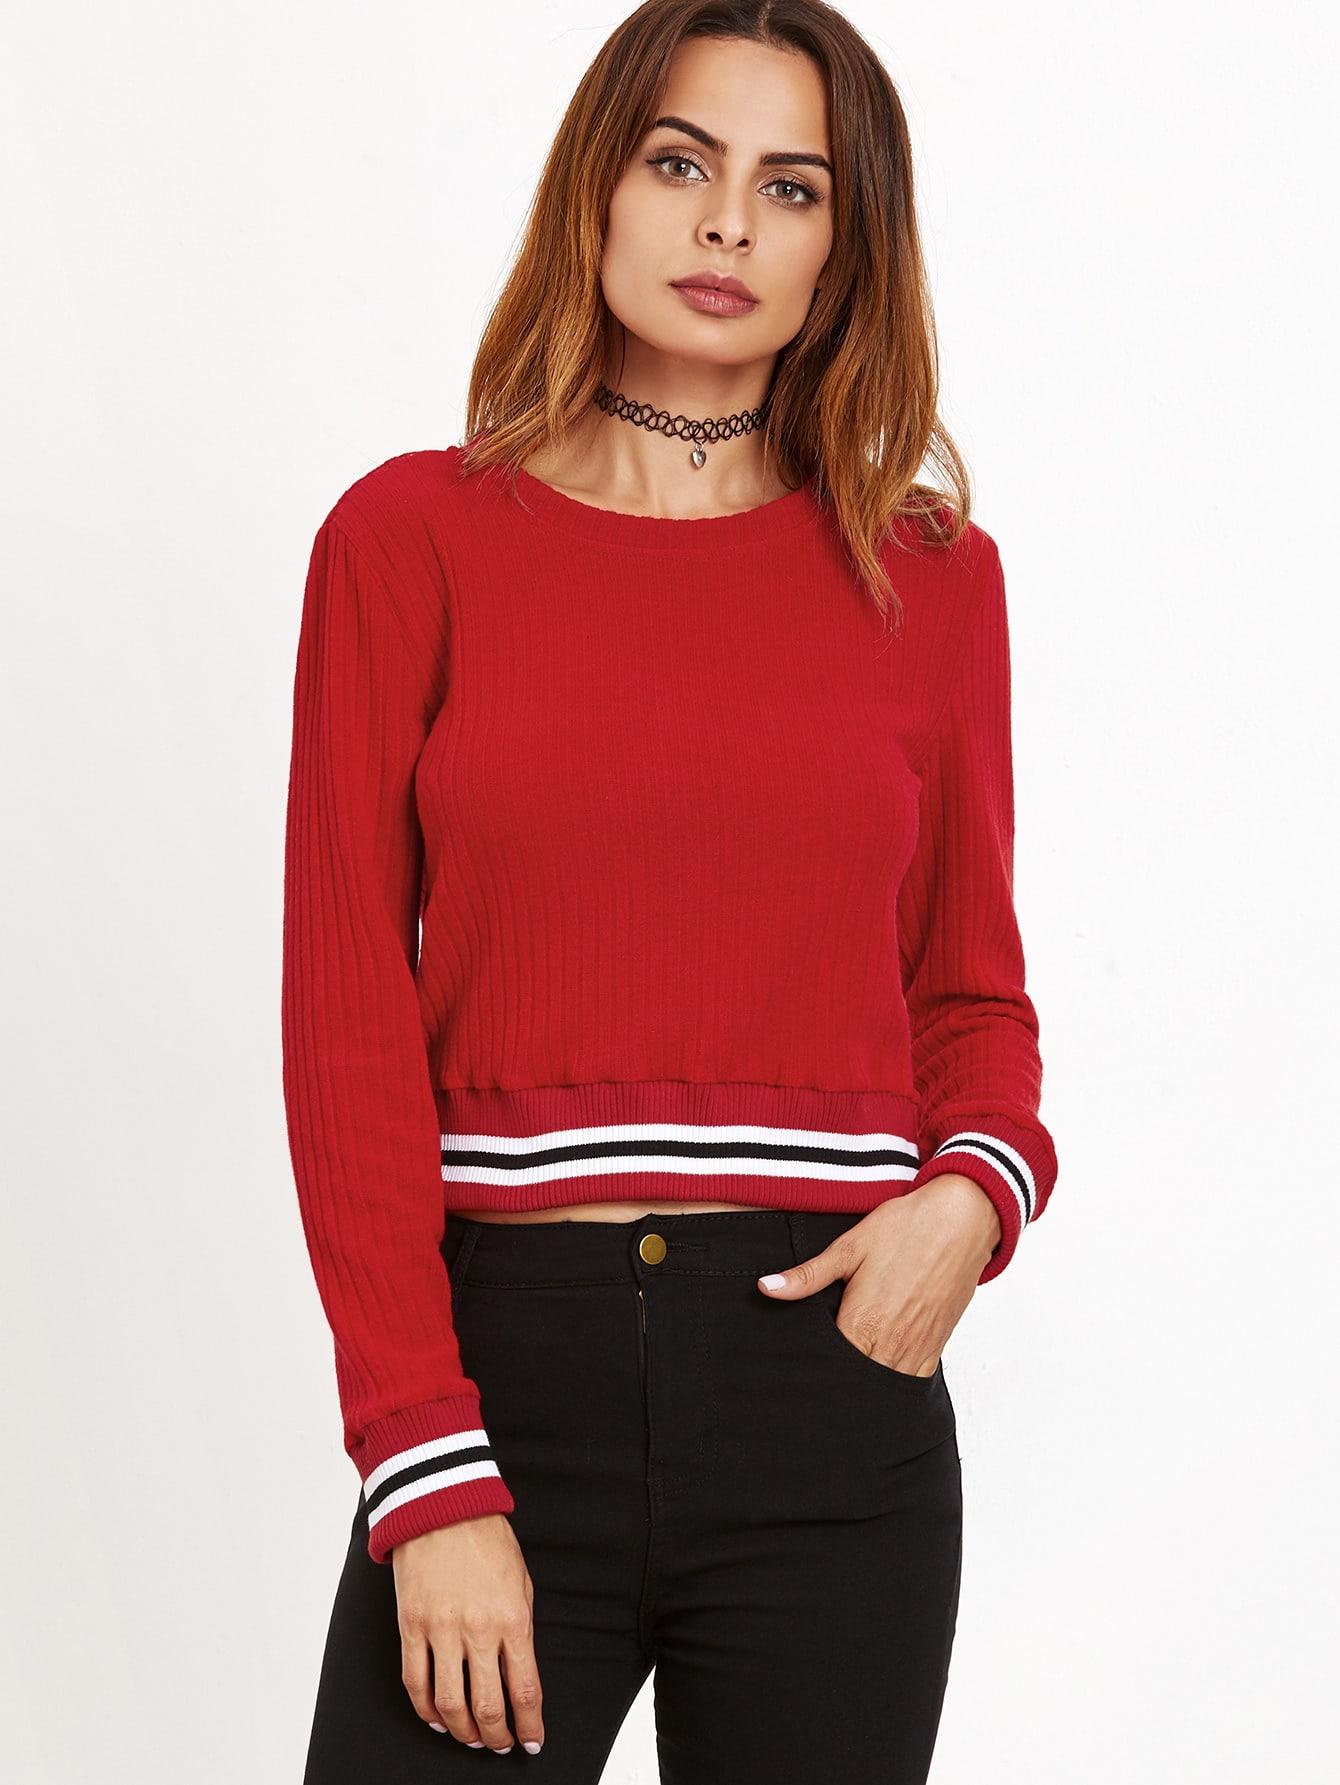 sweater161024131_2